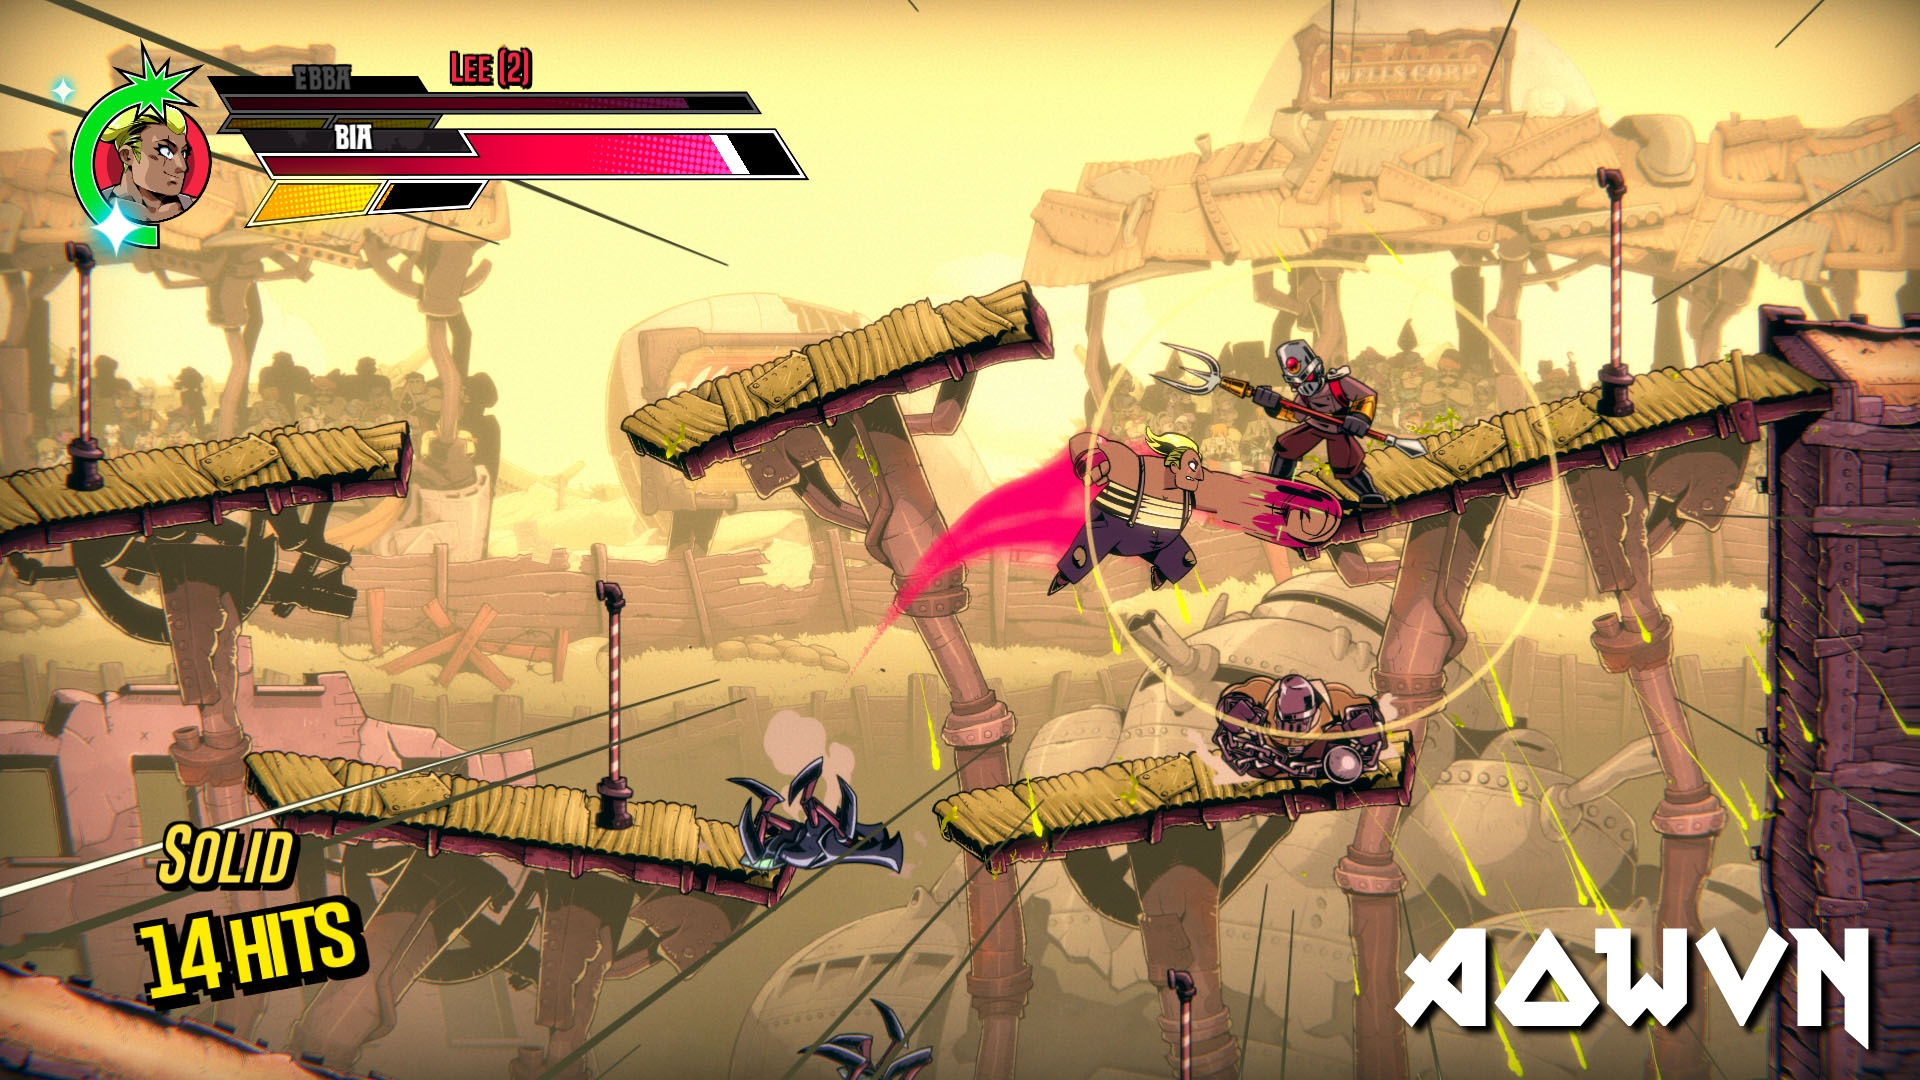 Speed Brawl Screenshot 1 1 - [ HOT ] Game : Speed Brawl | PC